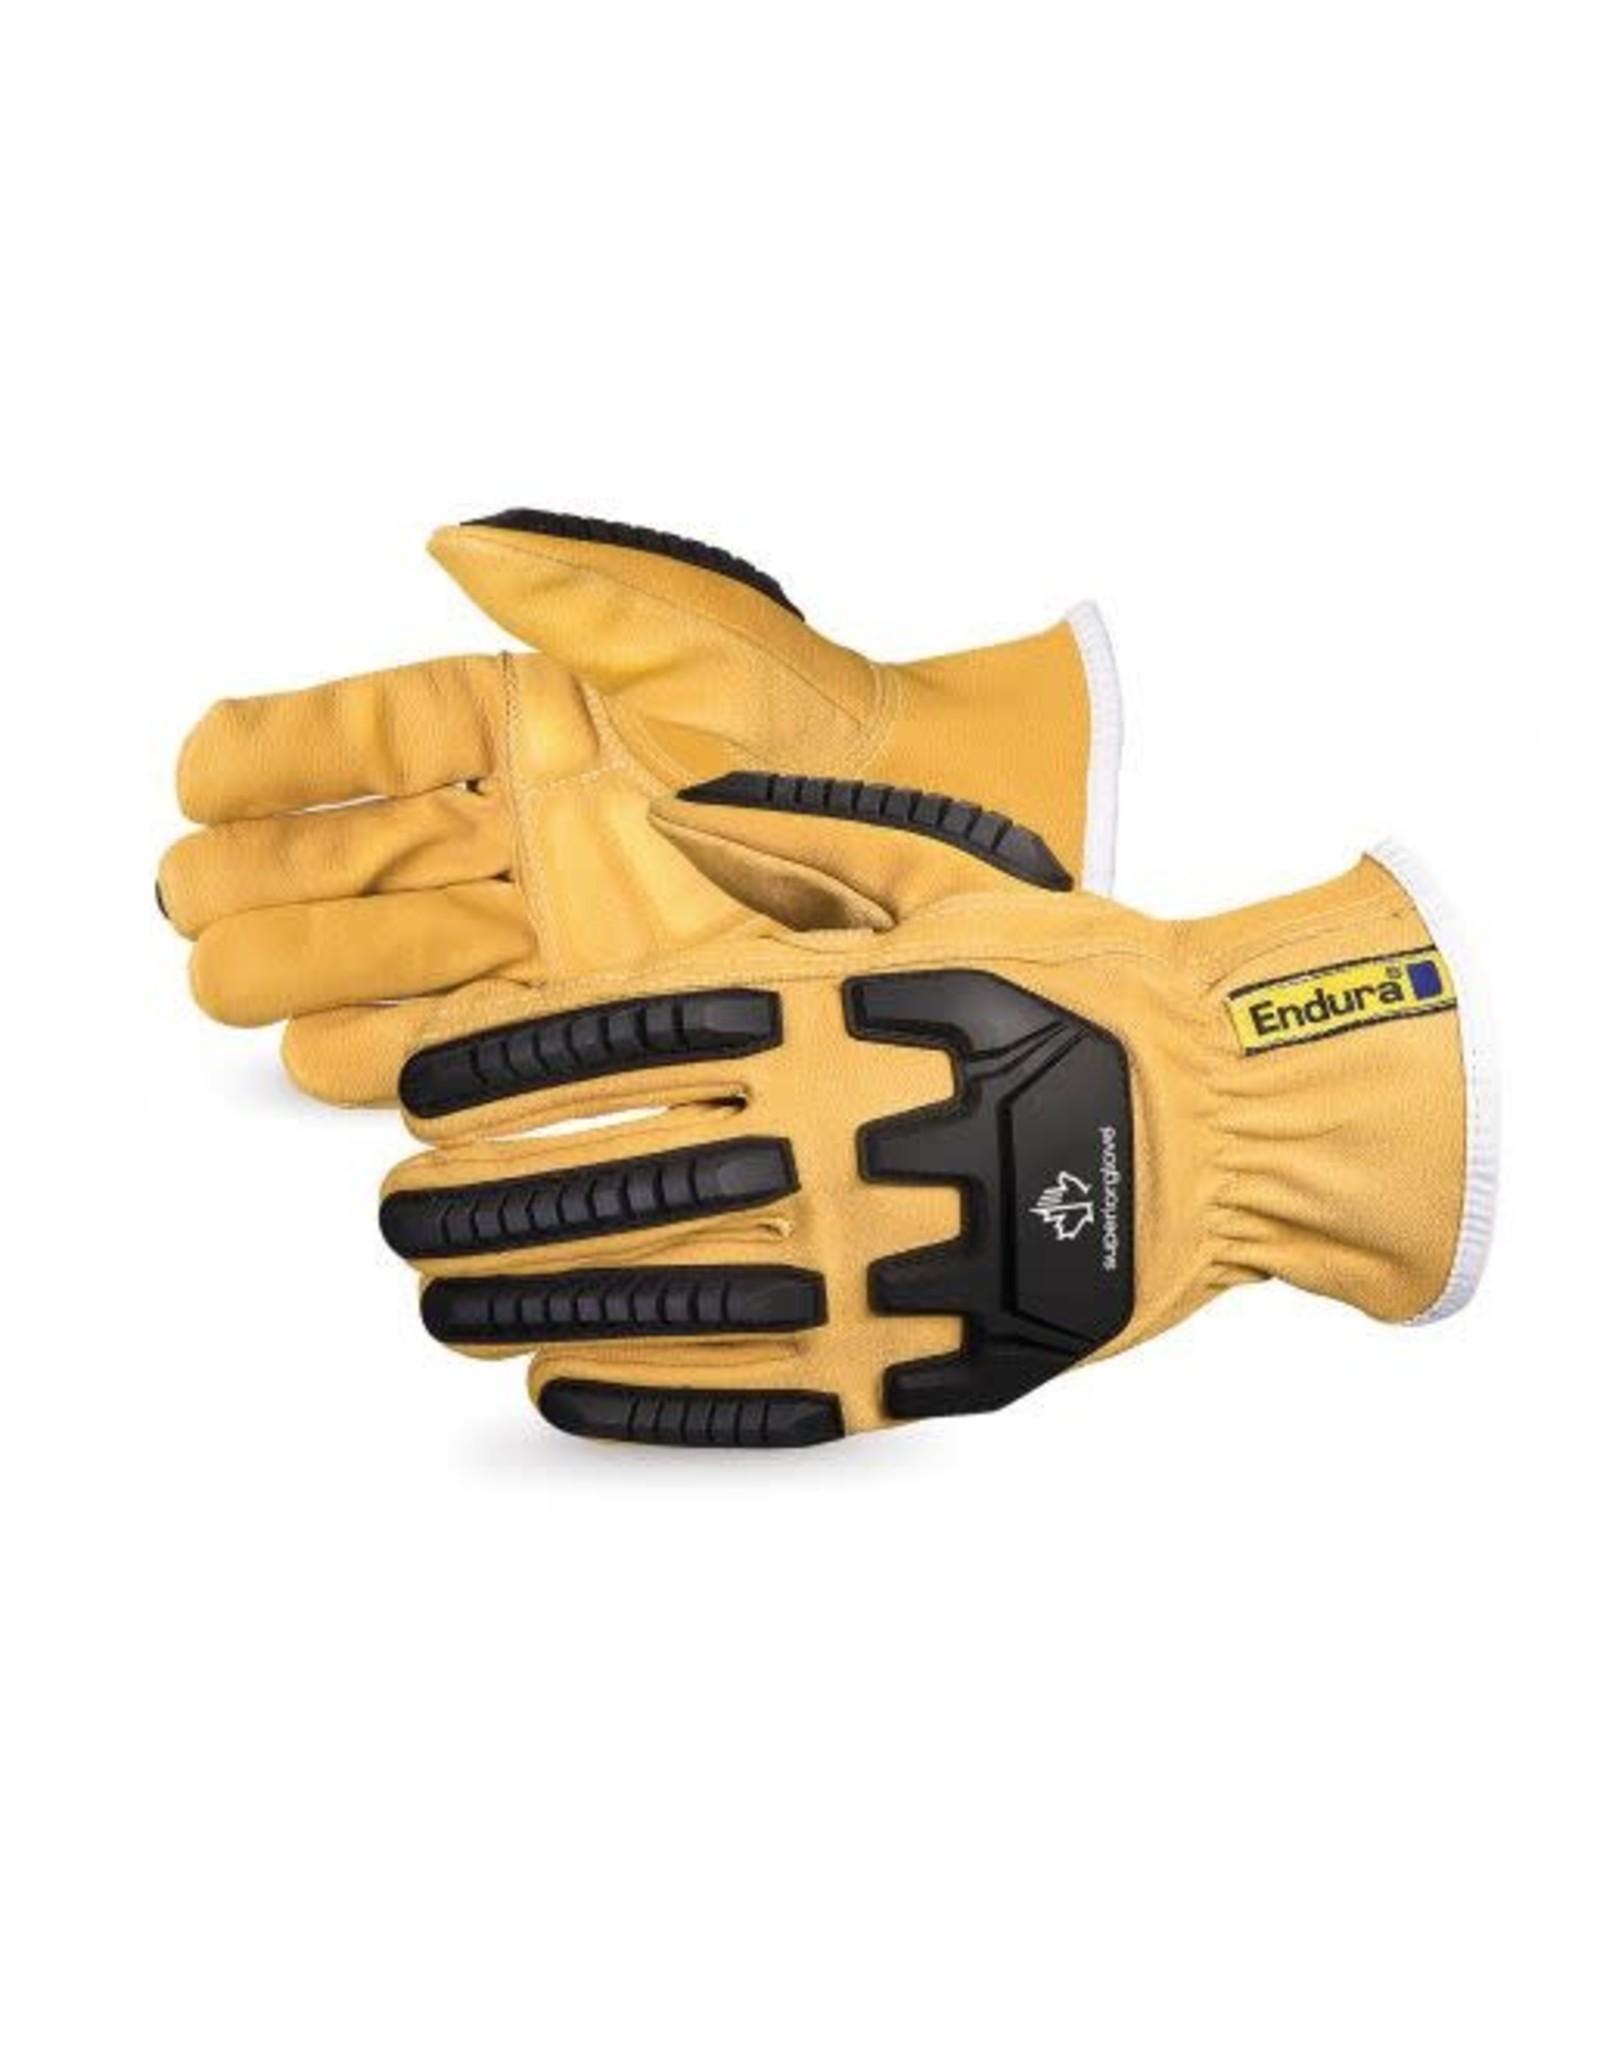 Superior Glove Superior Glove Endura Impact-Resistant Oilbloc Goatskin Kevlar - Lined Driver Glove